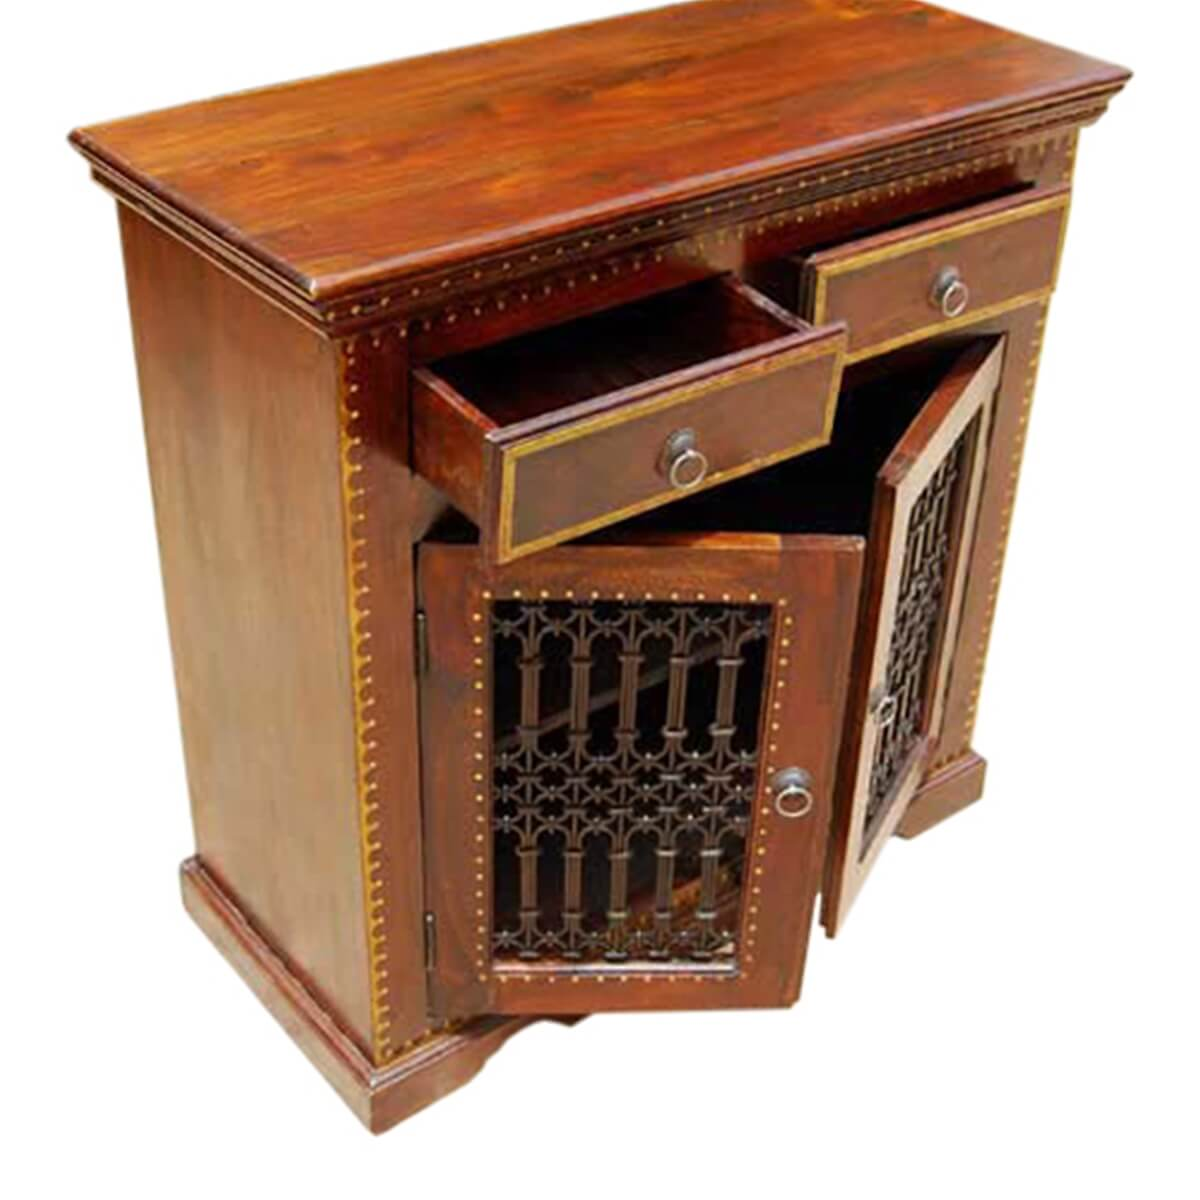 Discount Kitchen Cabinets Philadelphia: Philadelphia Handcrafted Solid Wood 2 Drawer TV Media